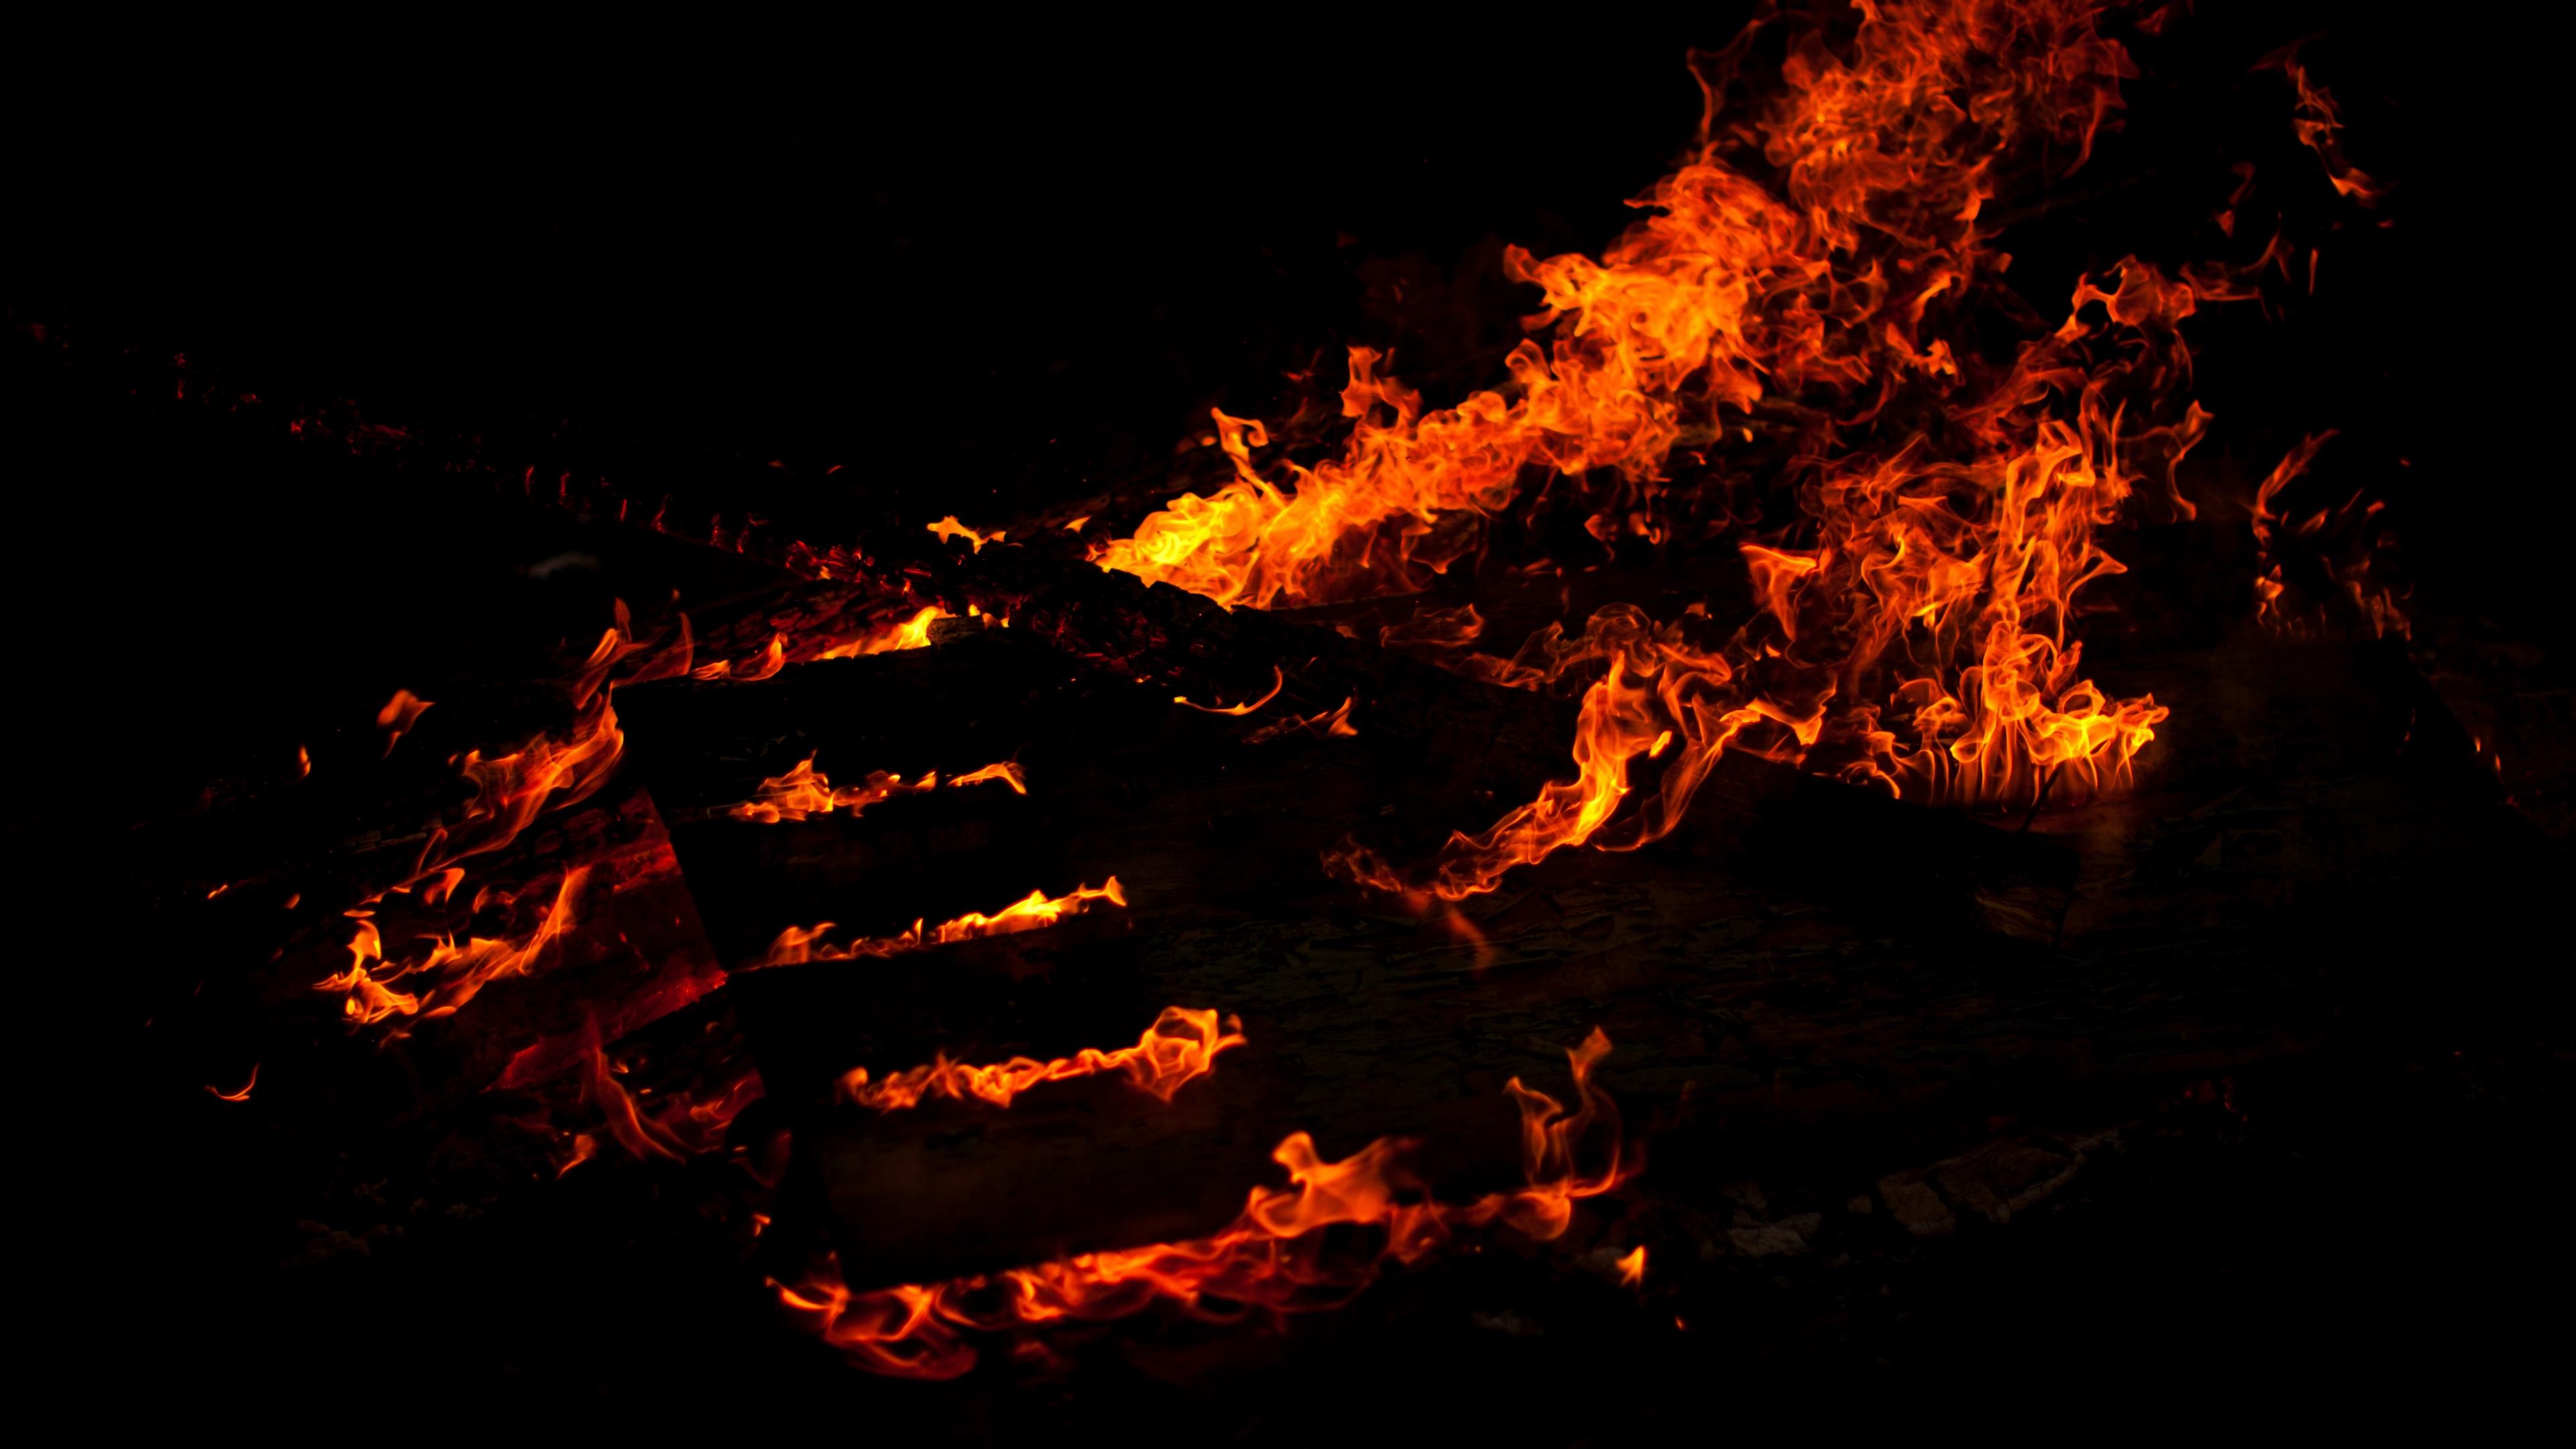 fire lines black background 4k 1540574728 - fire, lines, black background 4k - Lines, Fire, black background